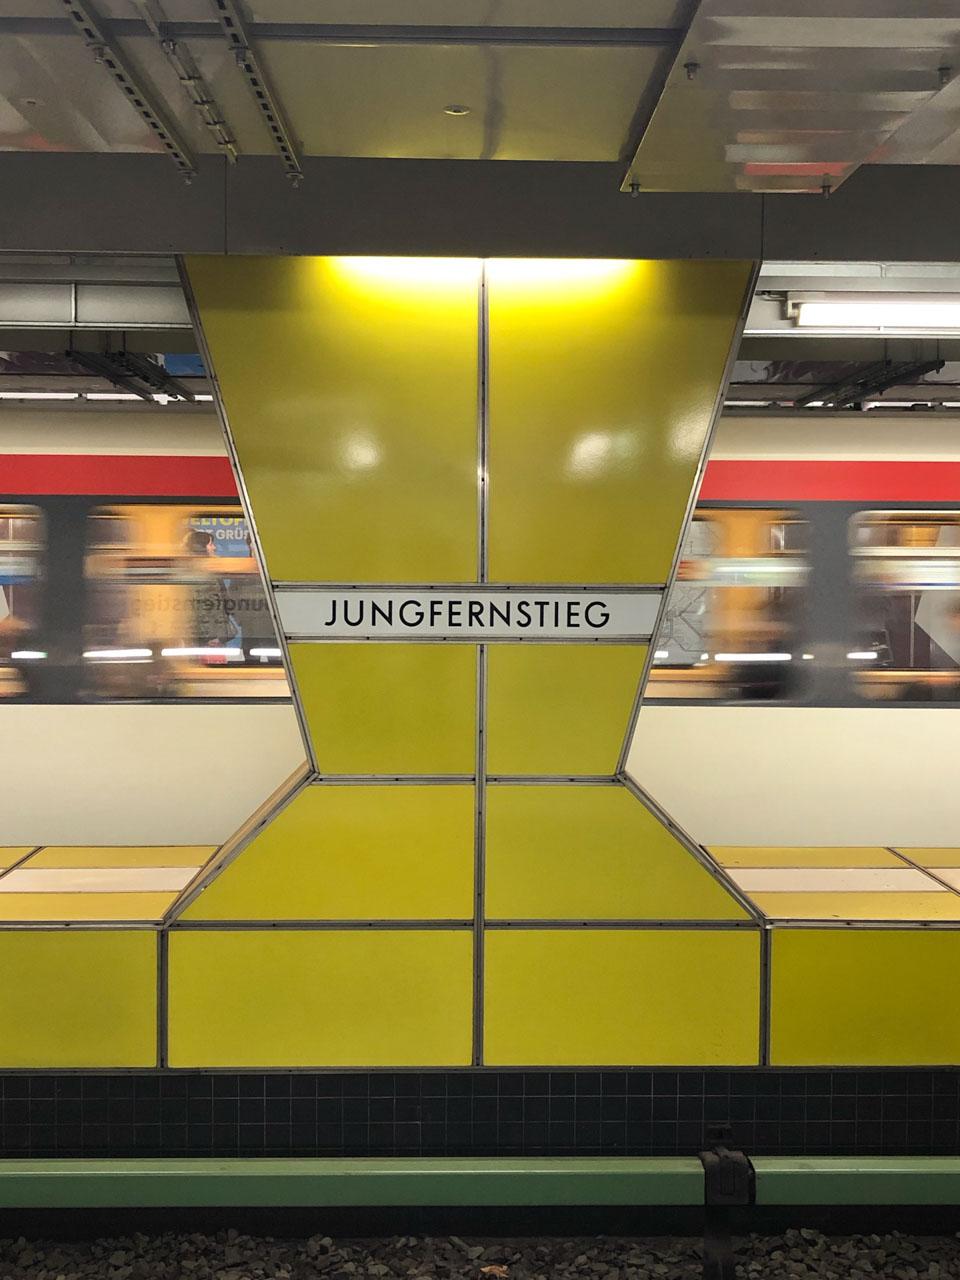 A train arriving at the Jungfernstieg station in Hamburg